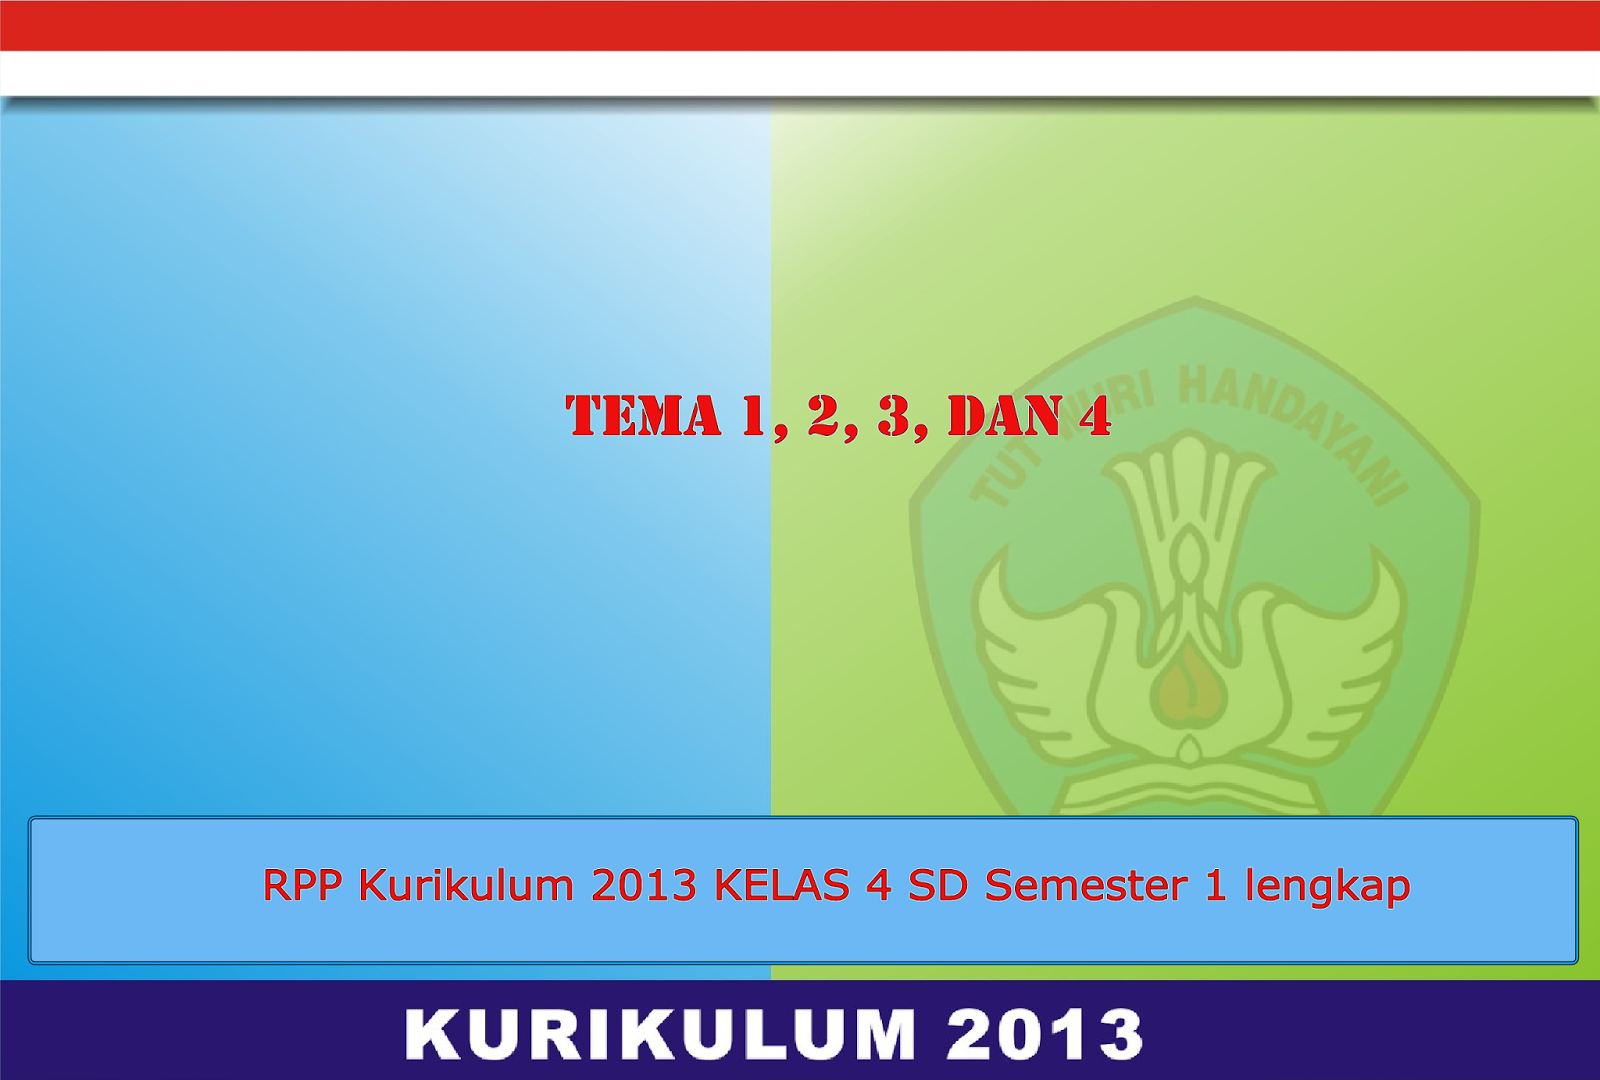 Download Rpp Kurikulum 2013 Lengkap Kelas 4 Iv Sd Semester 1 Terbaru Sharing Operator Sekolah